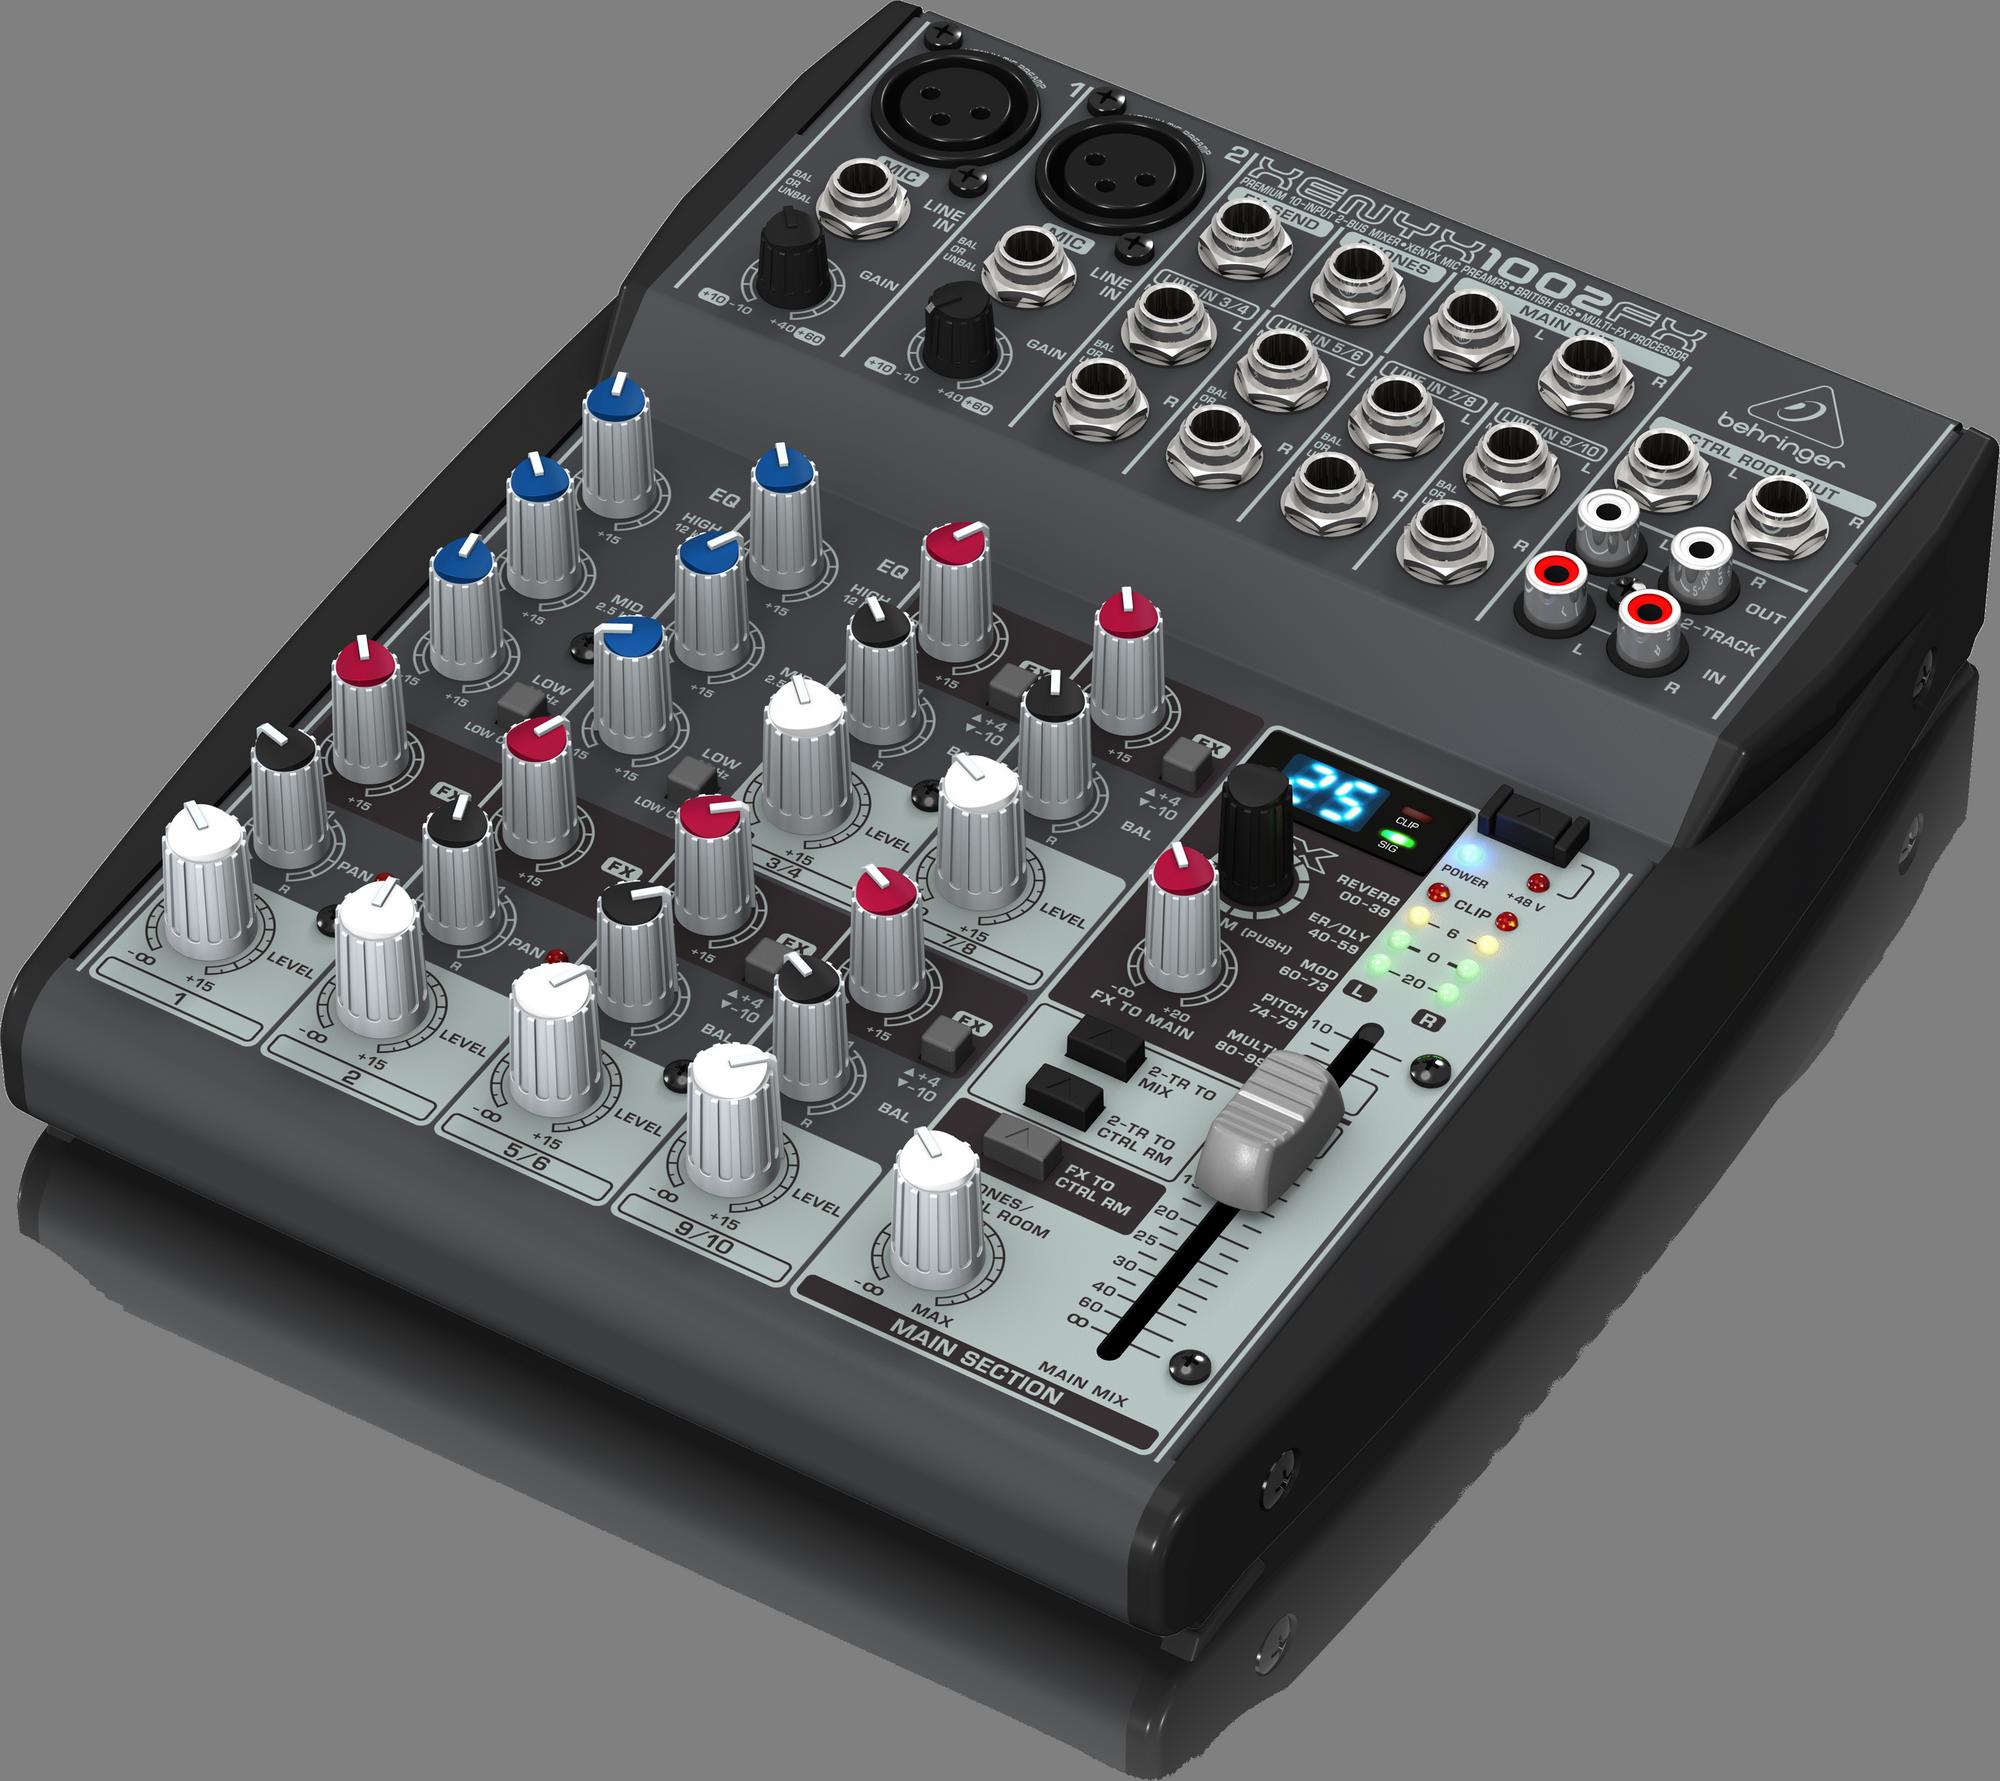 Behringer XENYX 1002FX - Analog Mixer